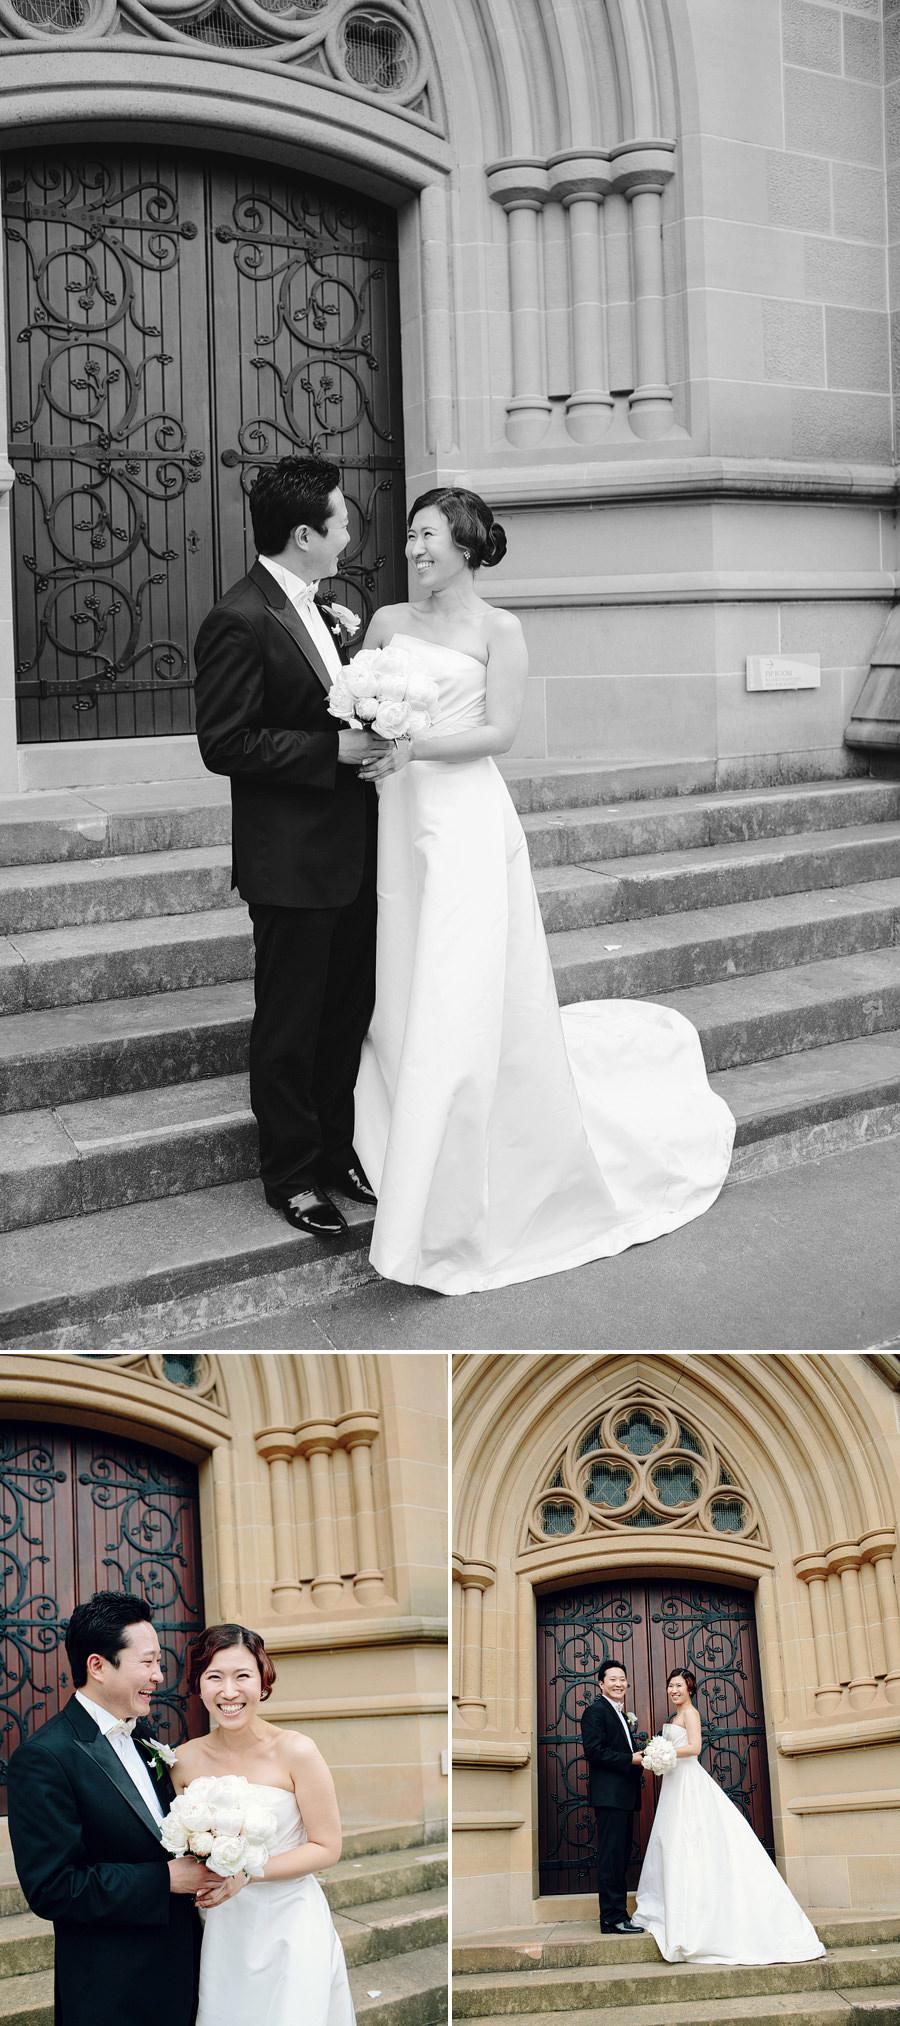 Sydney Wedding Photographer: Bride & Groom portraits outside church